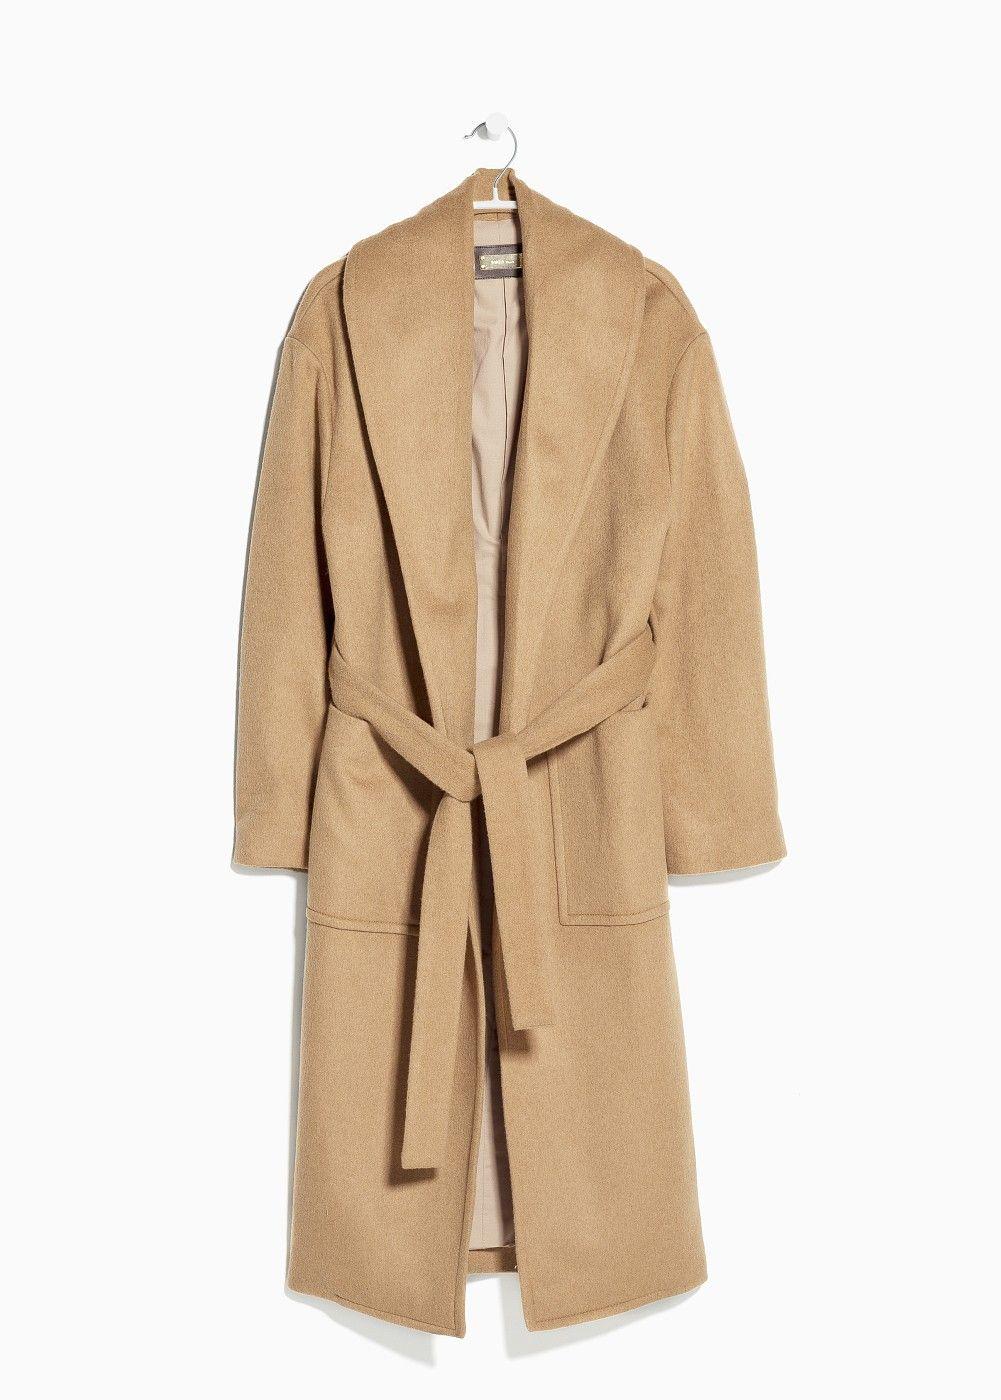 Manteau camel femme ceinture